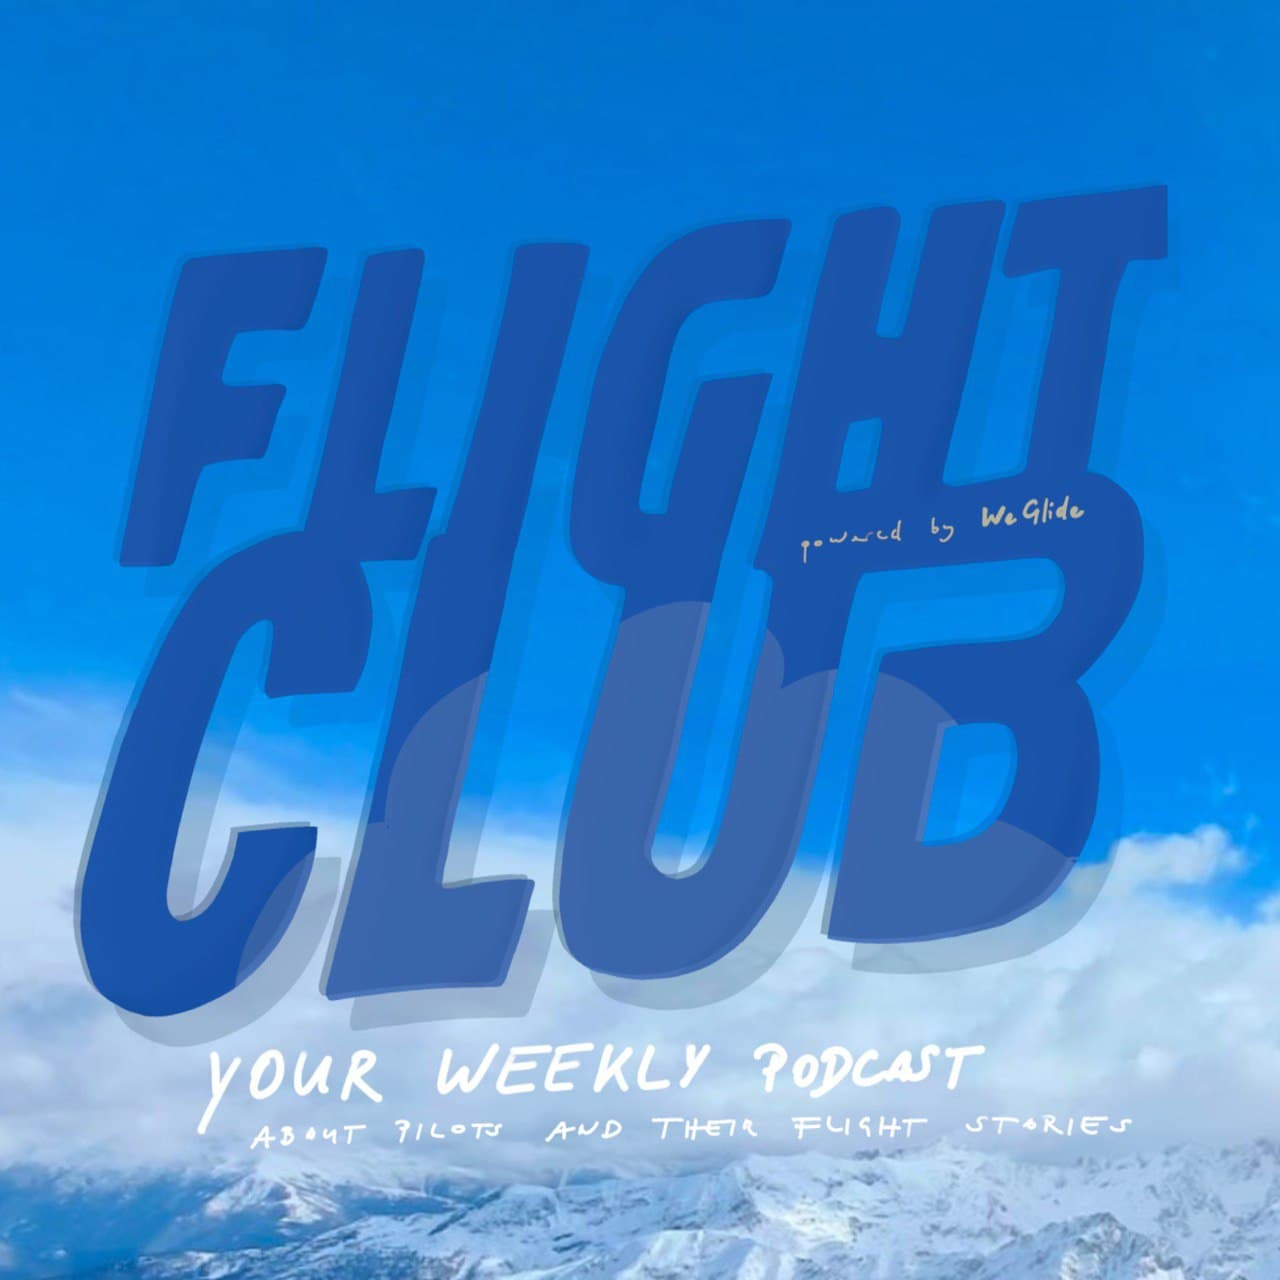 Bild zum Thema Flight Club Podcast